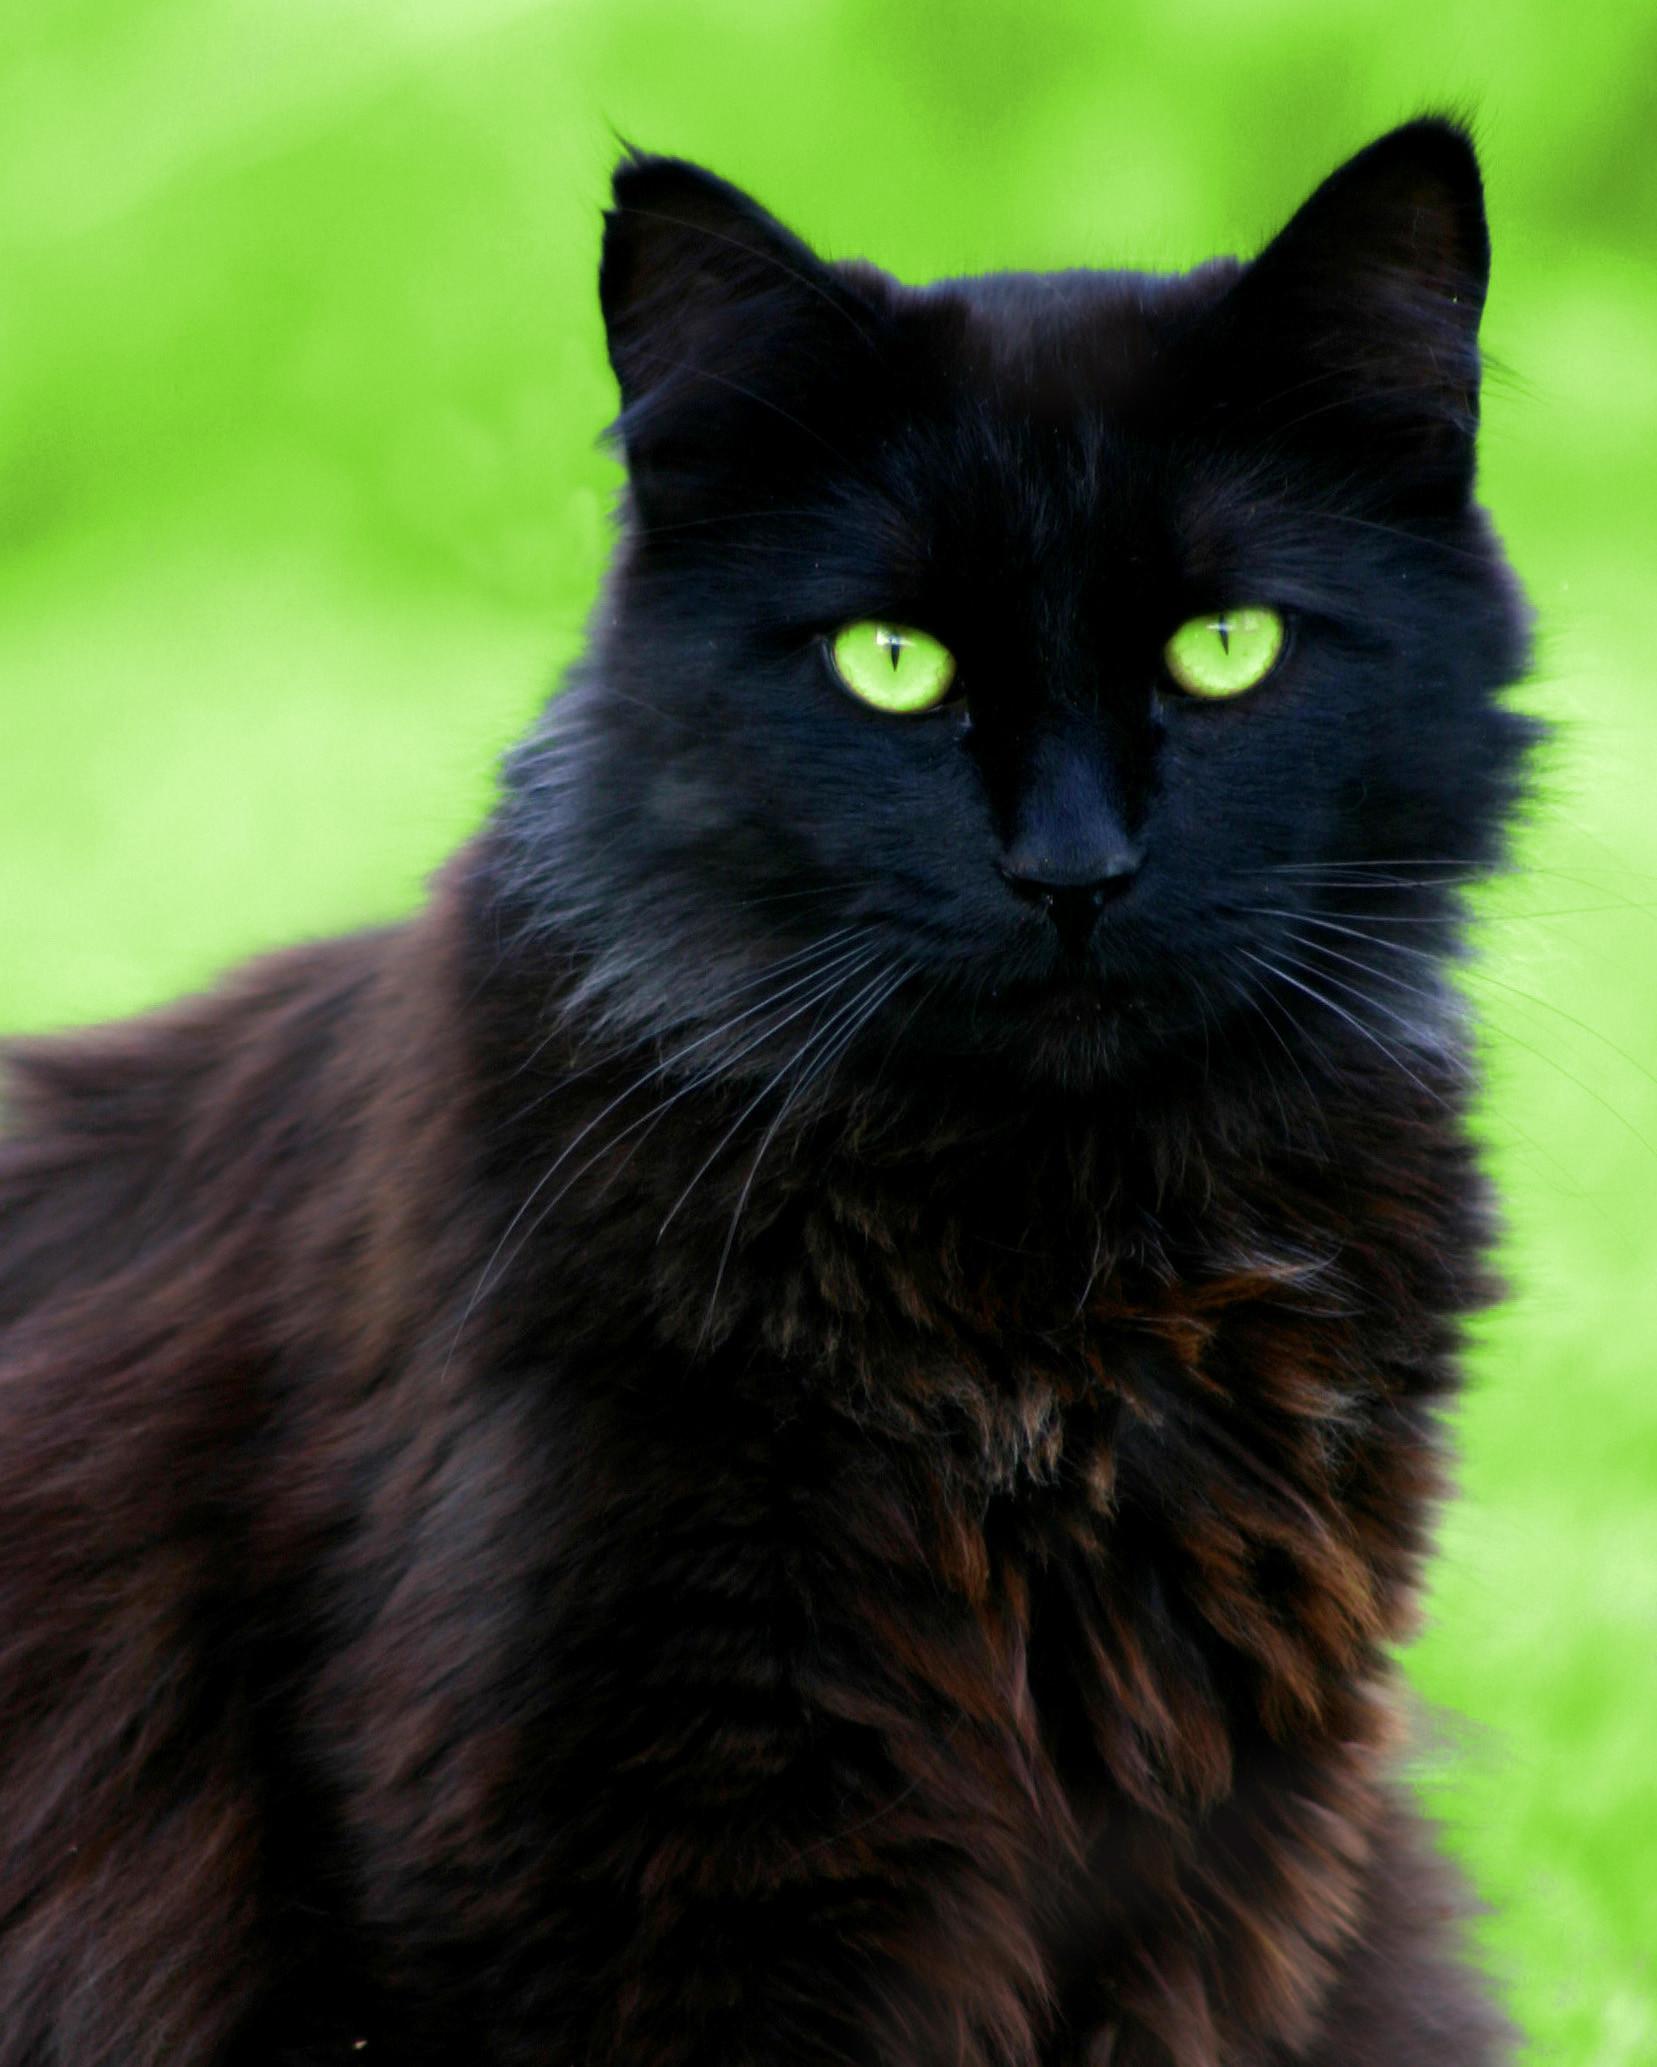 Black Cat Eyes Wallpaper (69+ Images